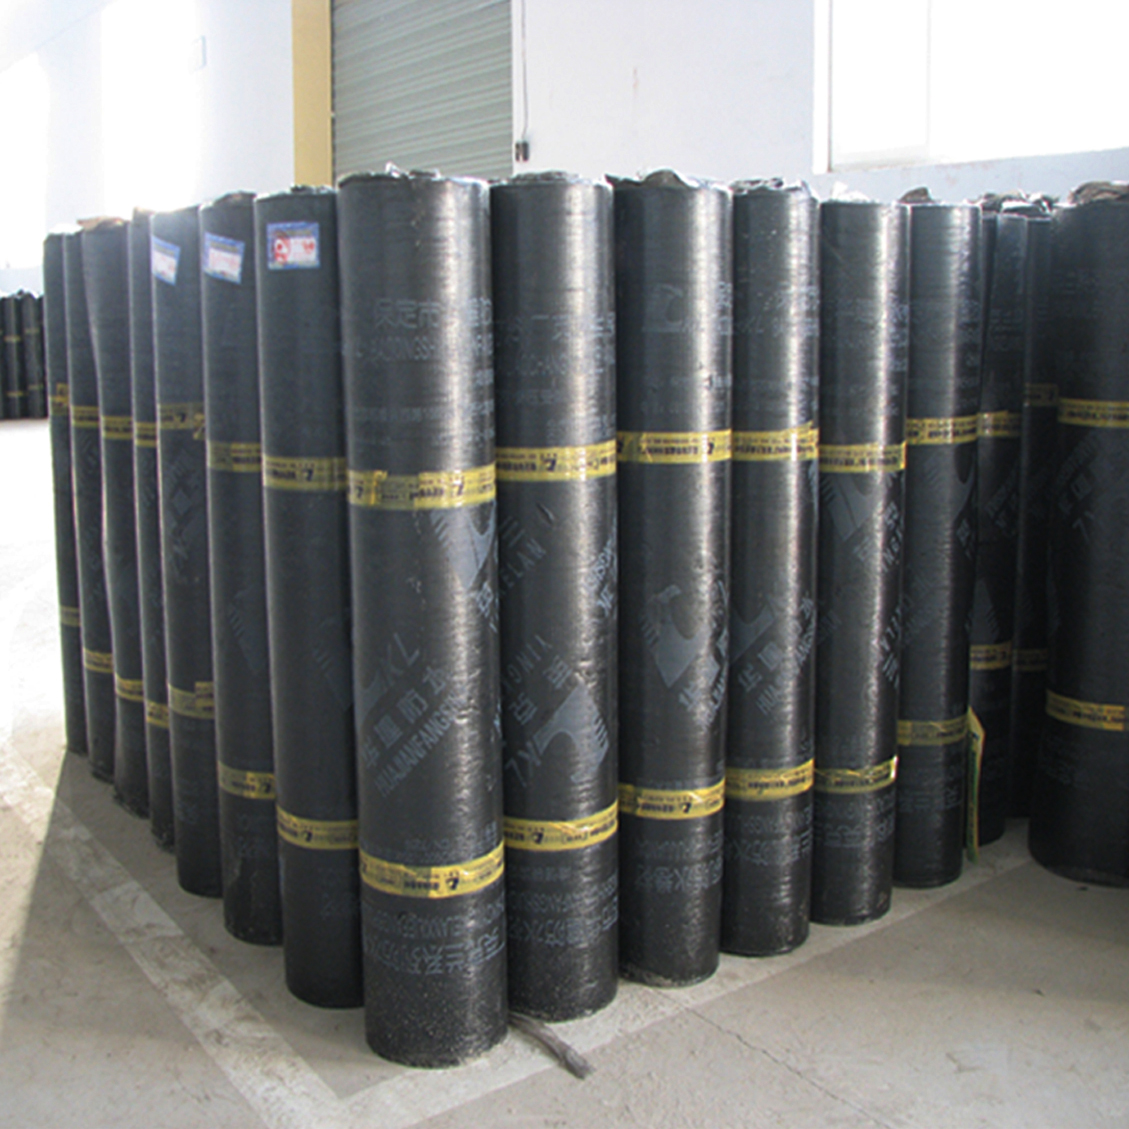 sbs bituminous outdoor roofing material waterproof membrane